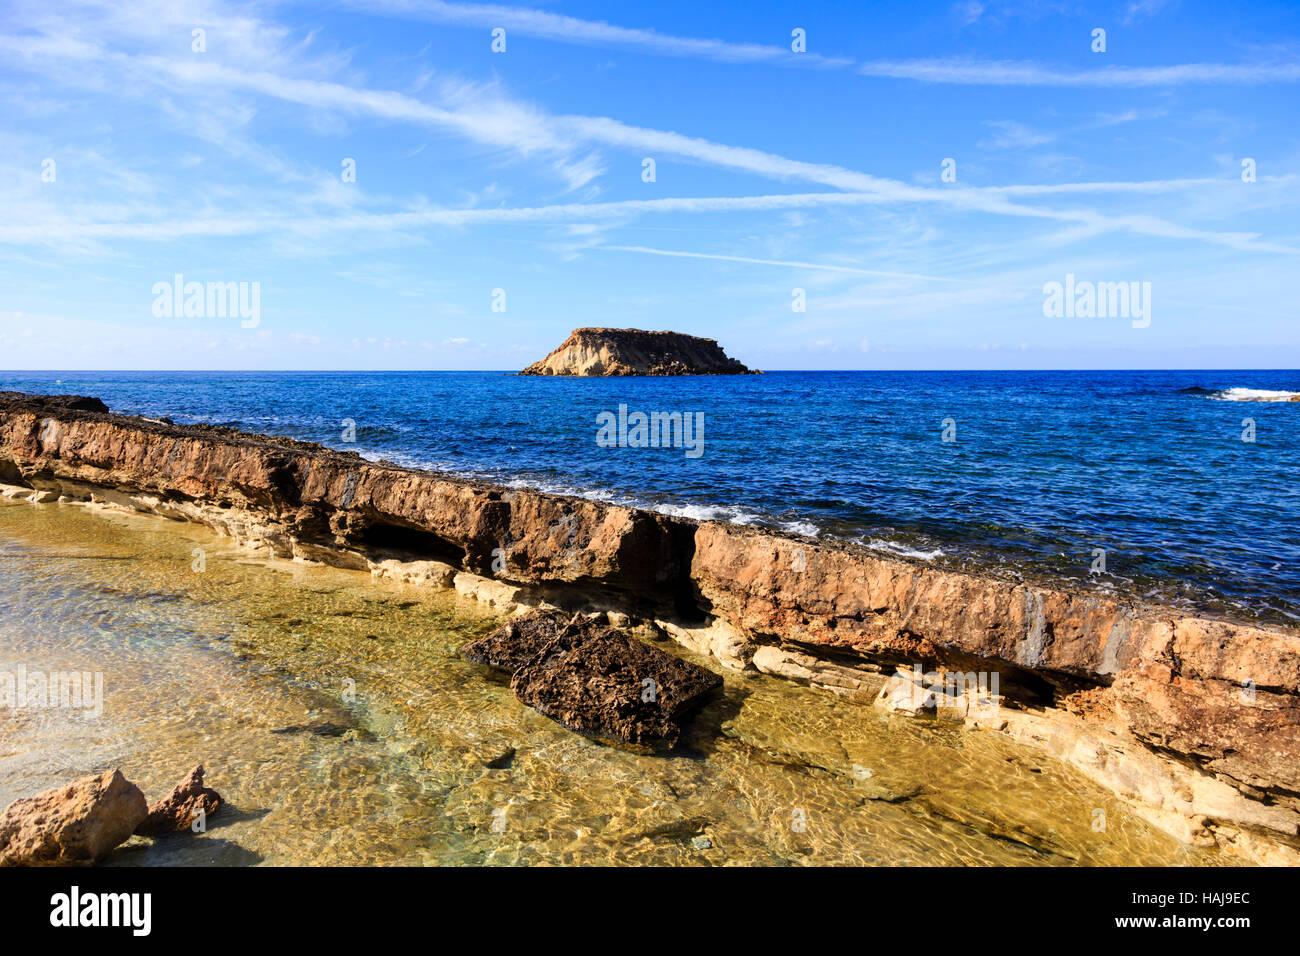 Beach at Agios Georgios with Geronisos island, Paphos.Cyprus - Stock Image